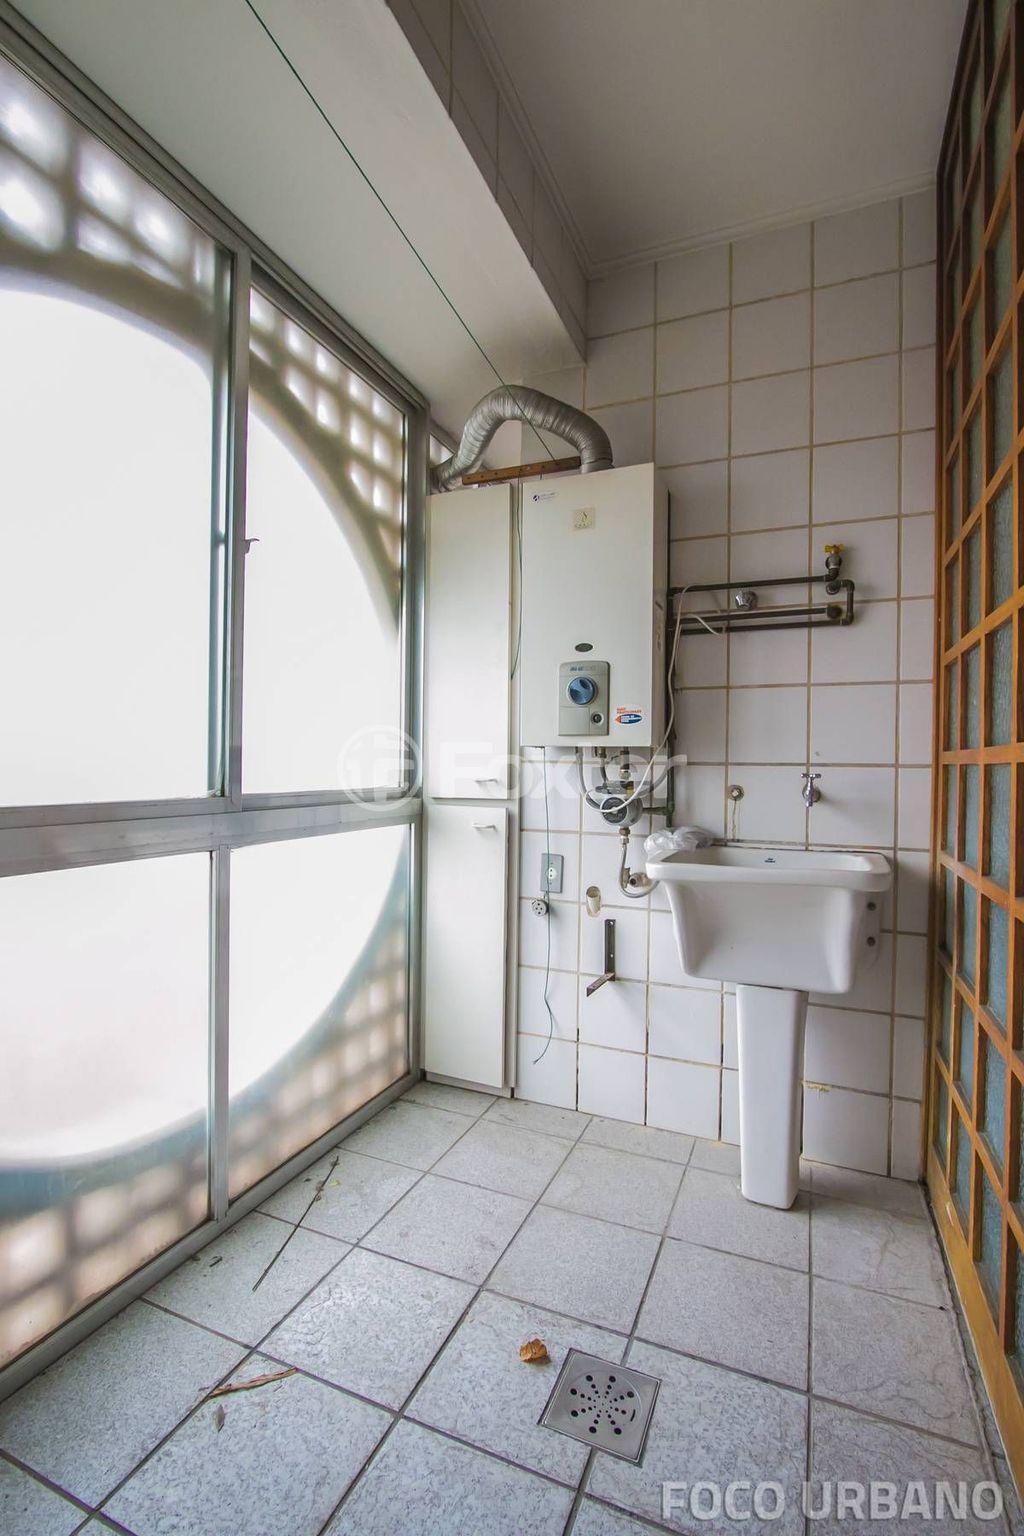 Cobertura 3 Dorm, Menino Deus, Porto Alegre (122222) - Foto 31